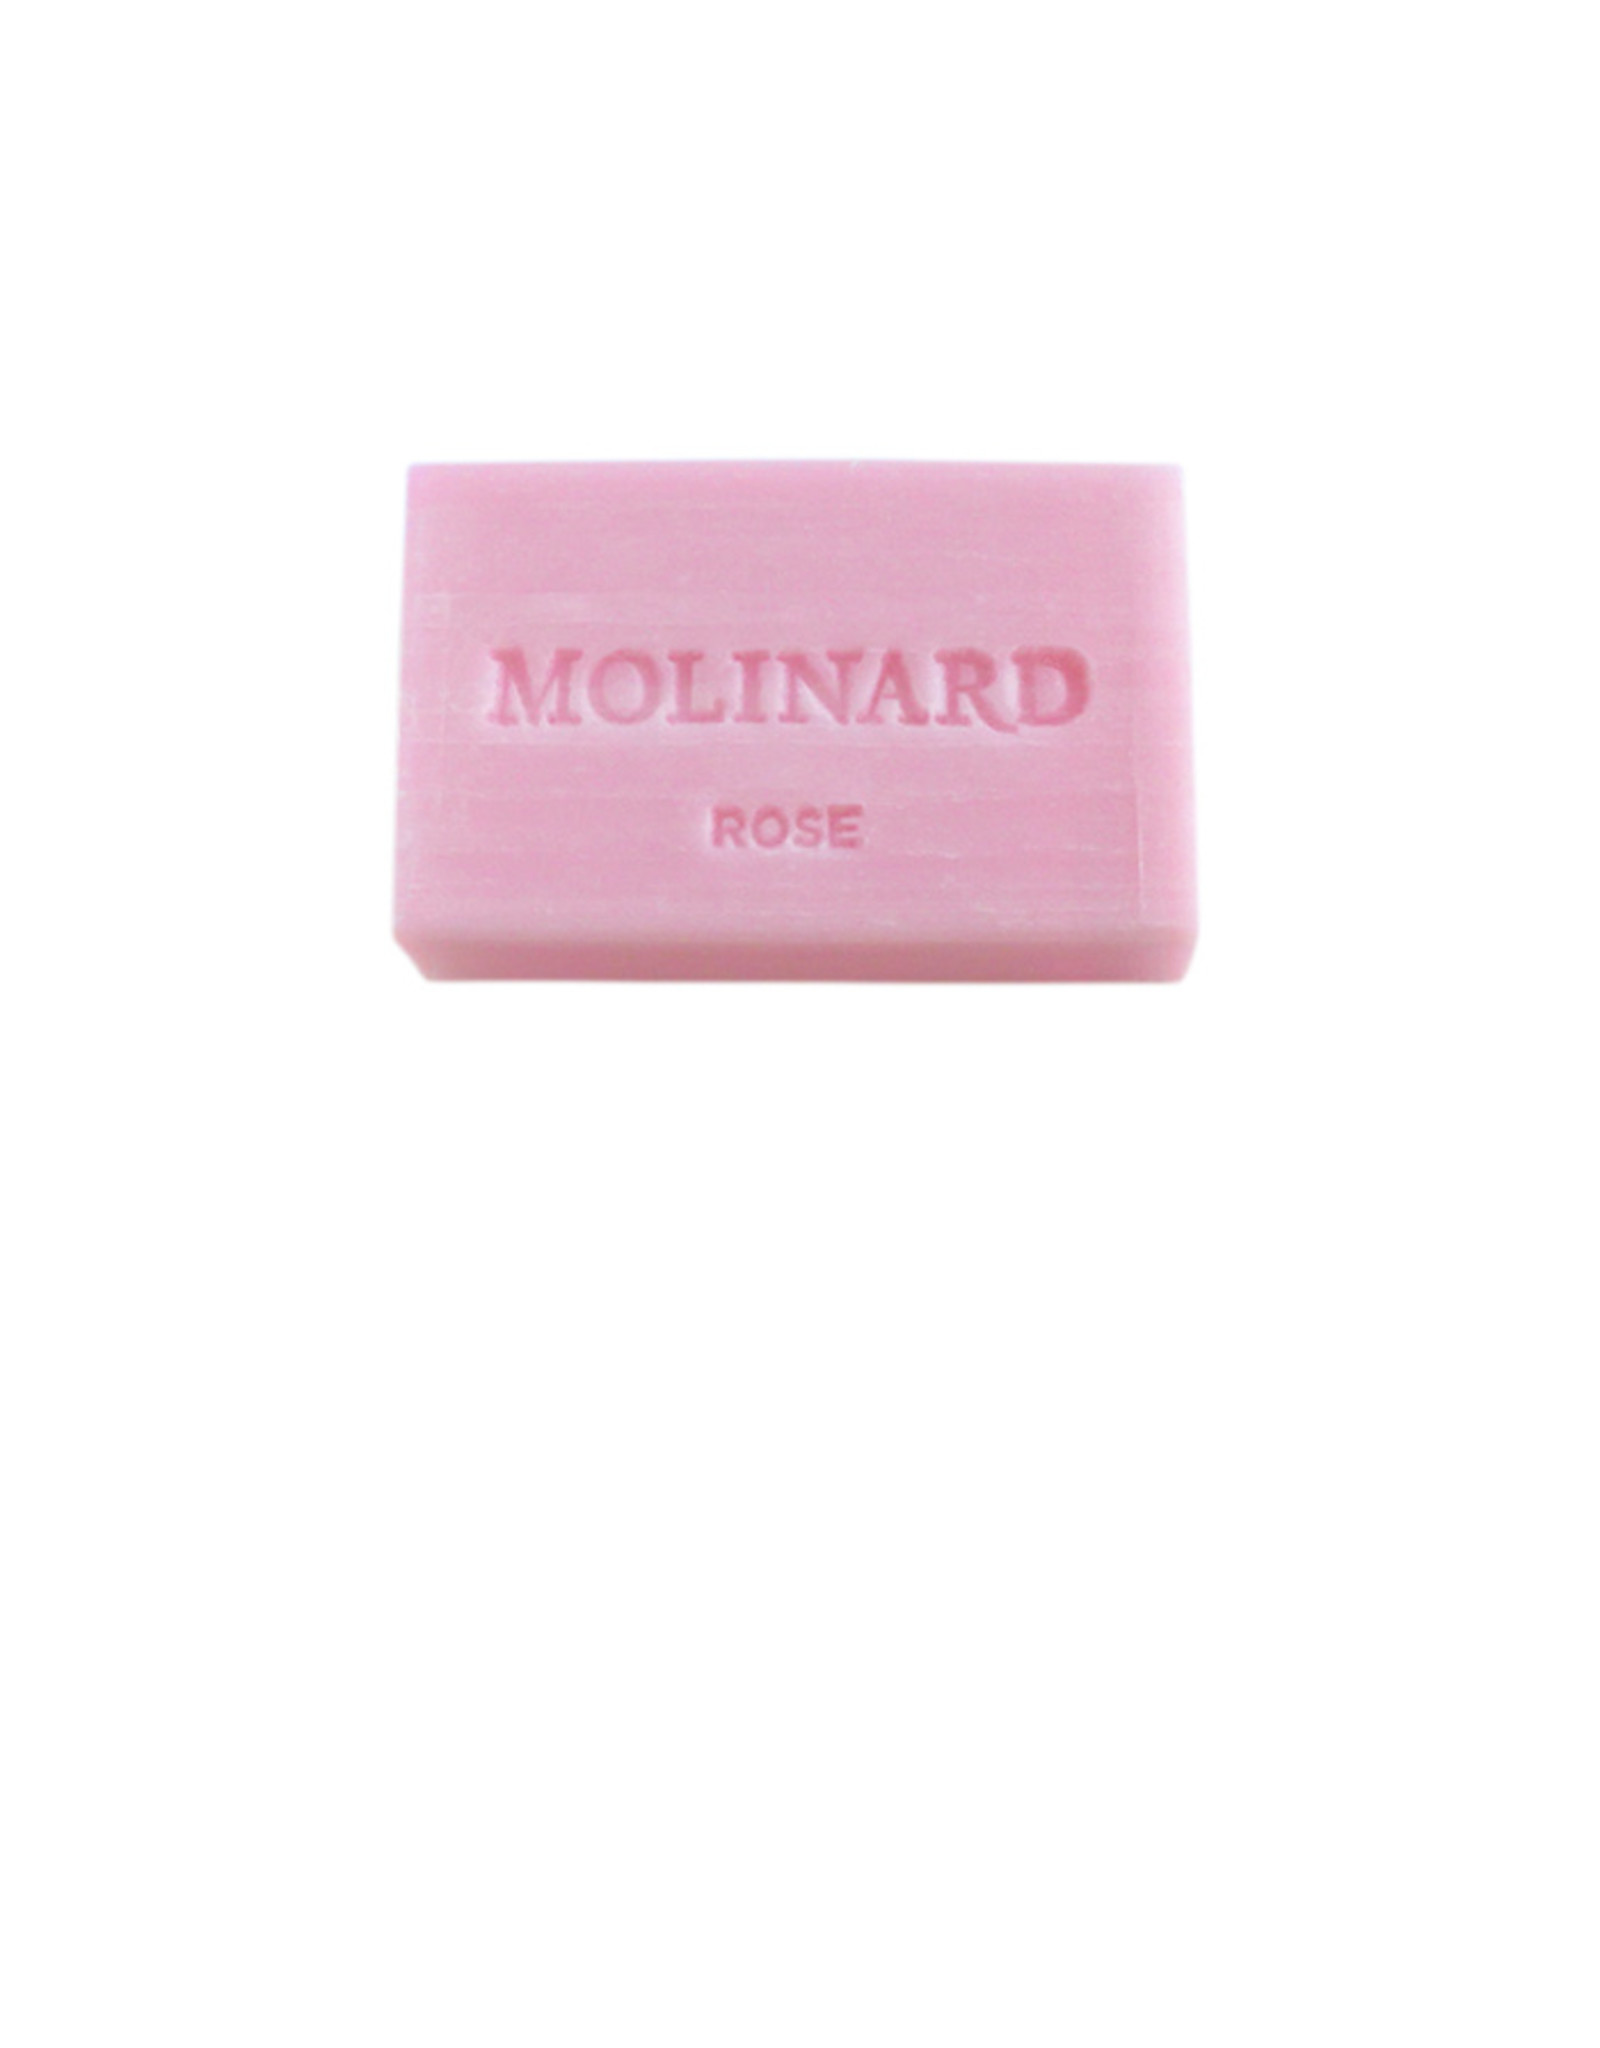 Molinard Rose Soap - Les Savons Artisanaux de Molinard